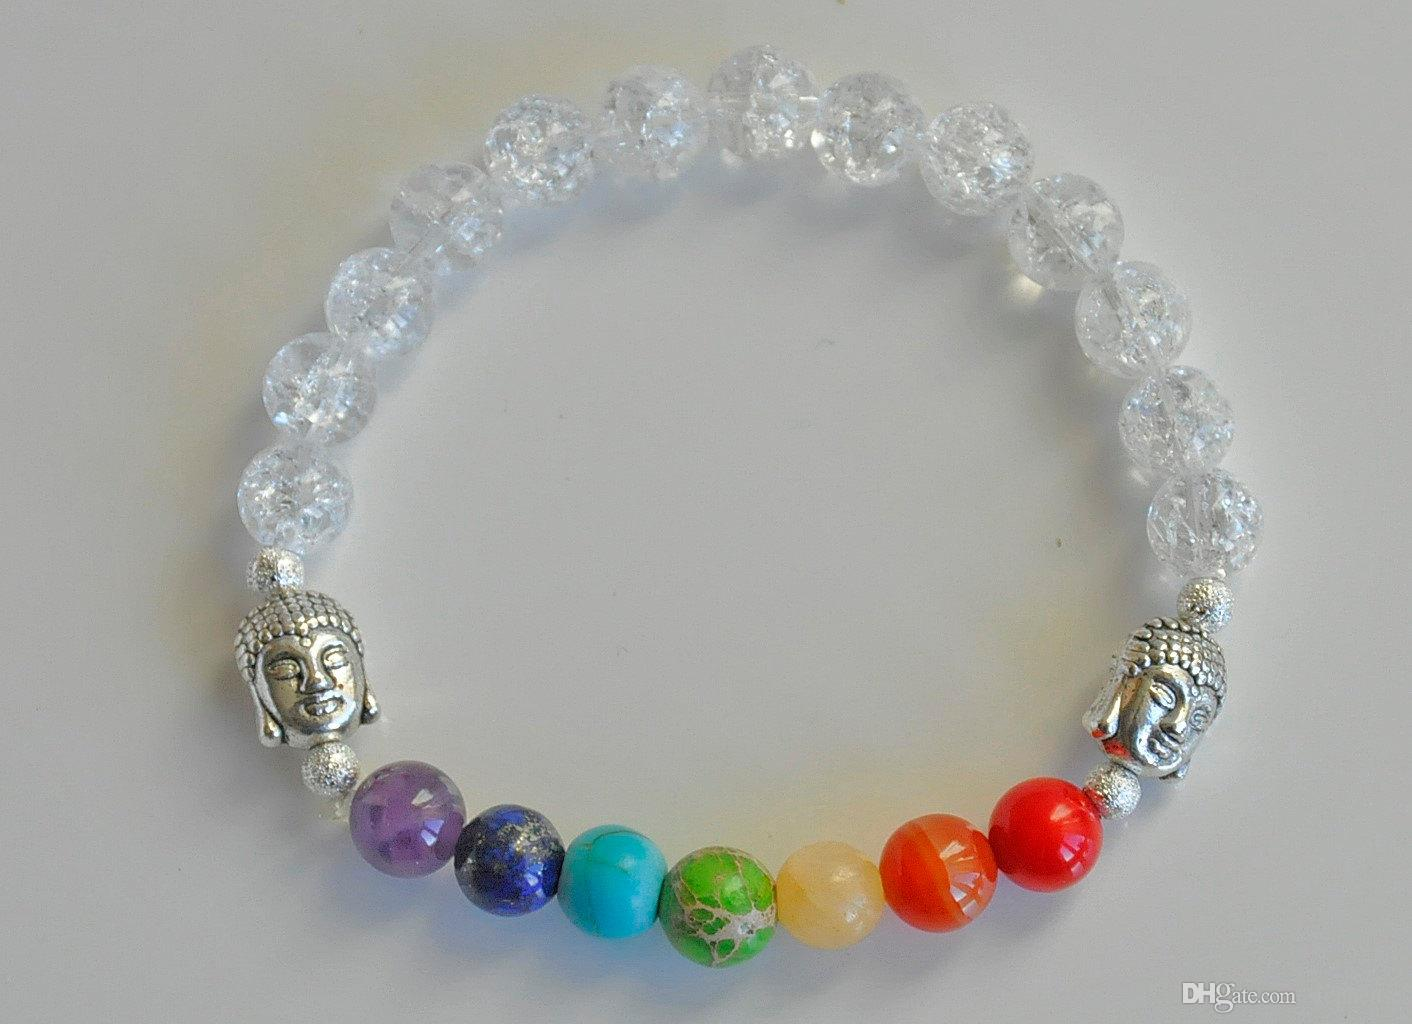 SN0223 Crystal Quartz Stone Buddha Chakra Power Energy Armband Reiki Mala Kralen Gebed Spiritualiteit Mind Body Spirit Armbanden